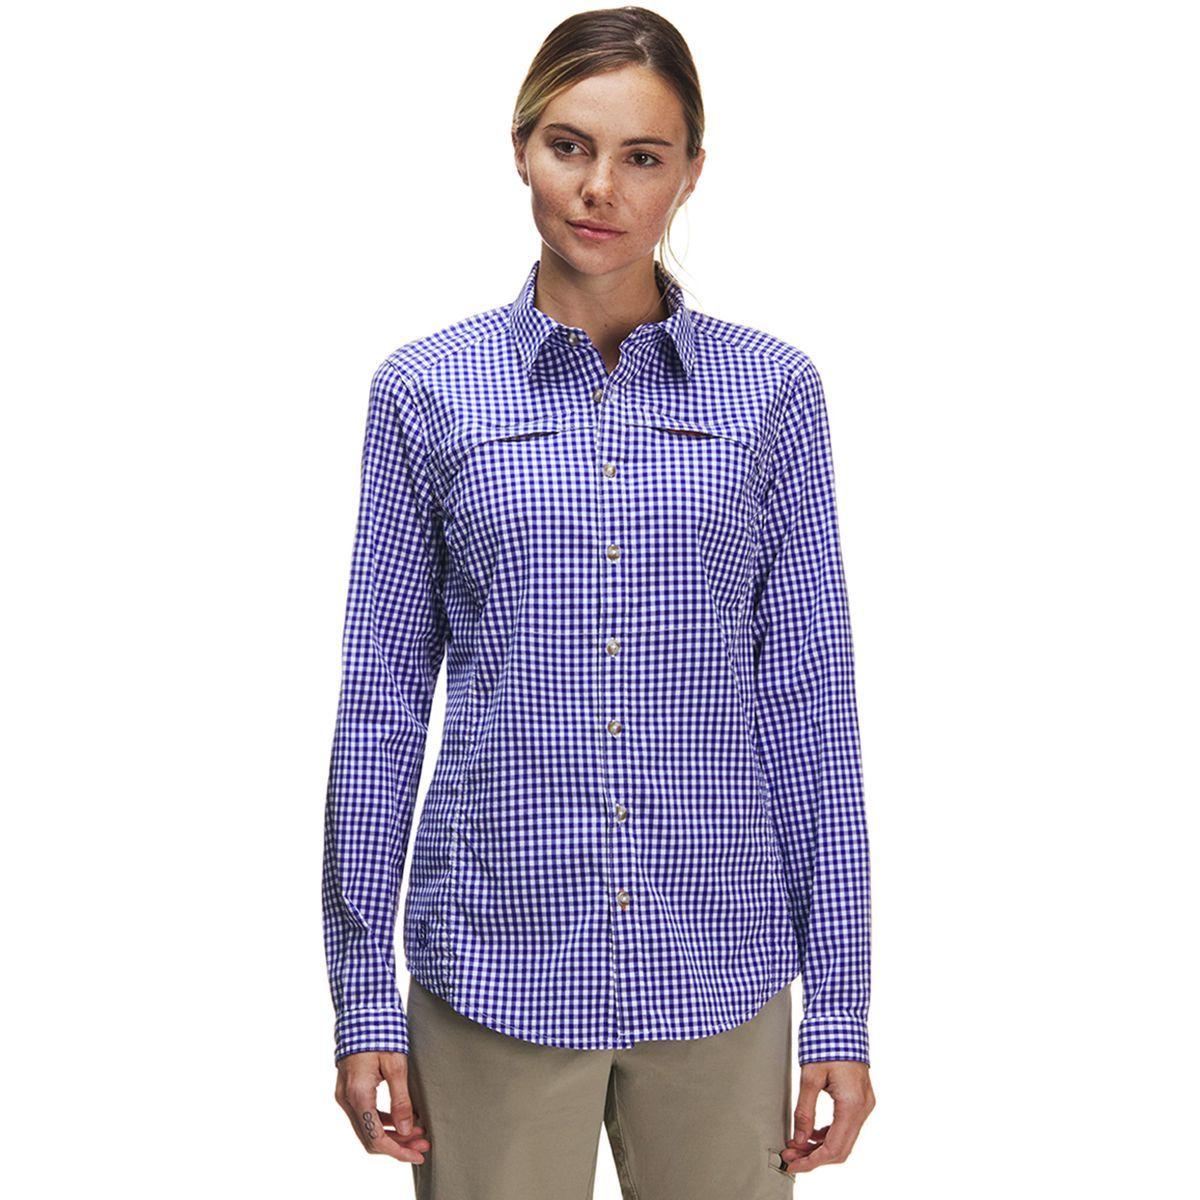 Orvis River Guide Tech Gingham Long-Sleeve Shirt - Women's